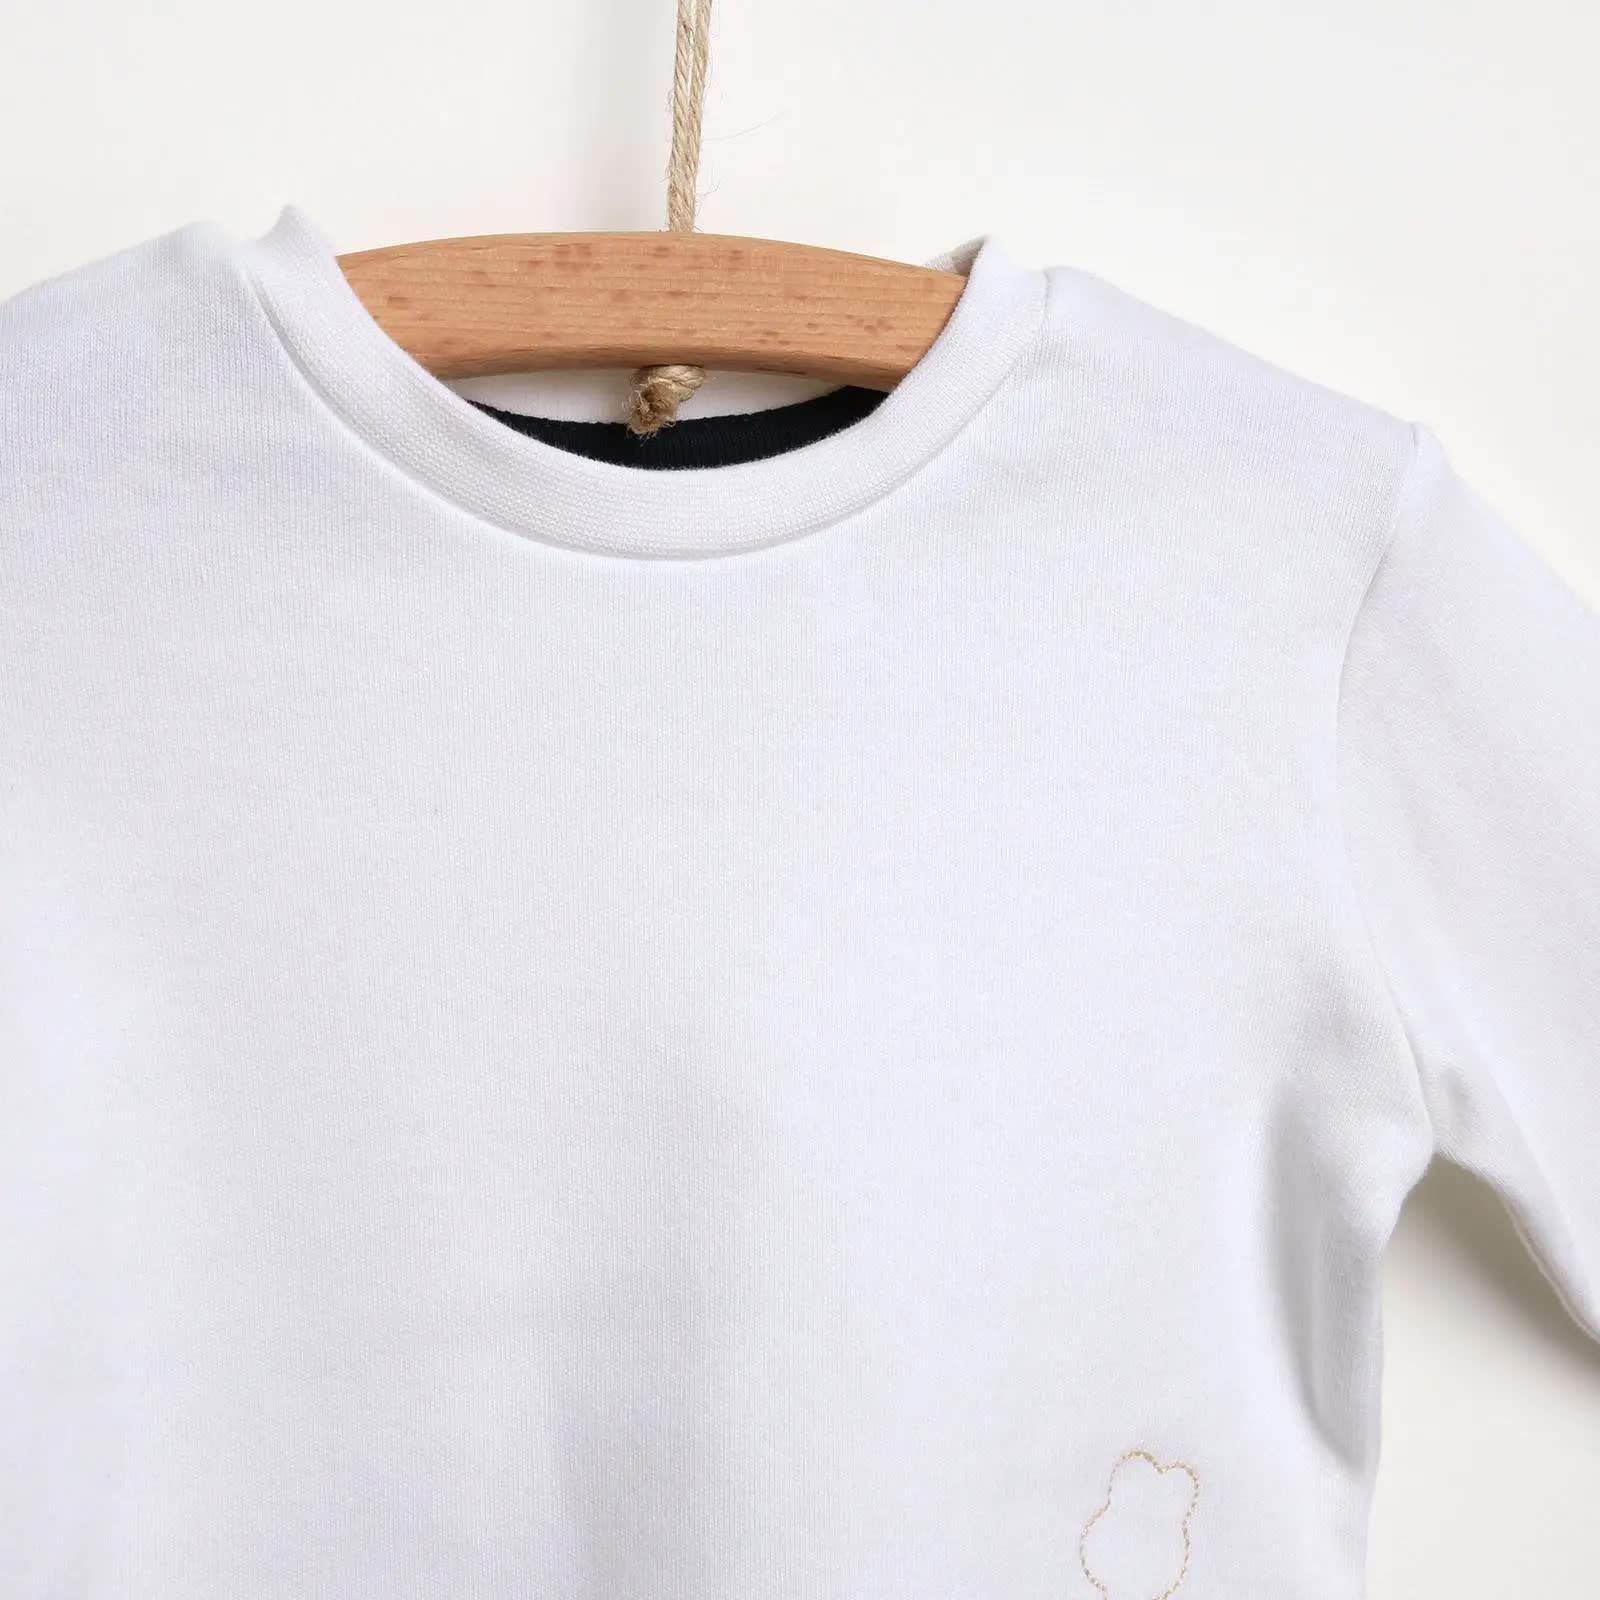 Country Boy Tema Sweatshirt-Patiksiz Alt